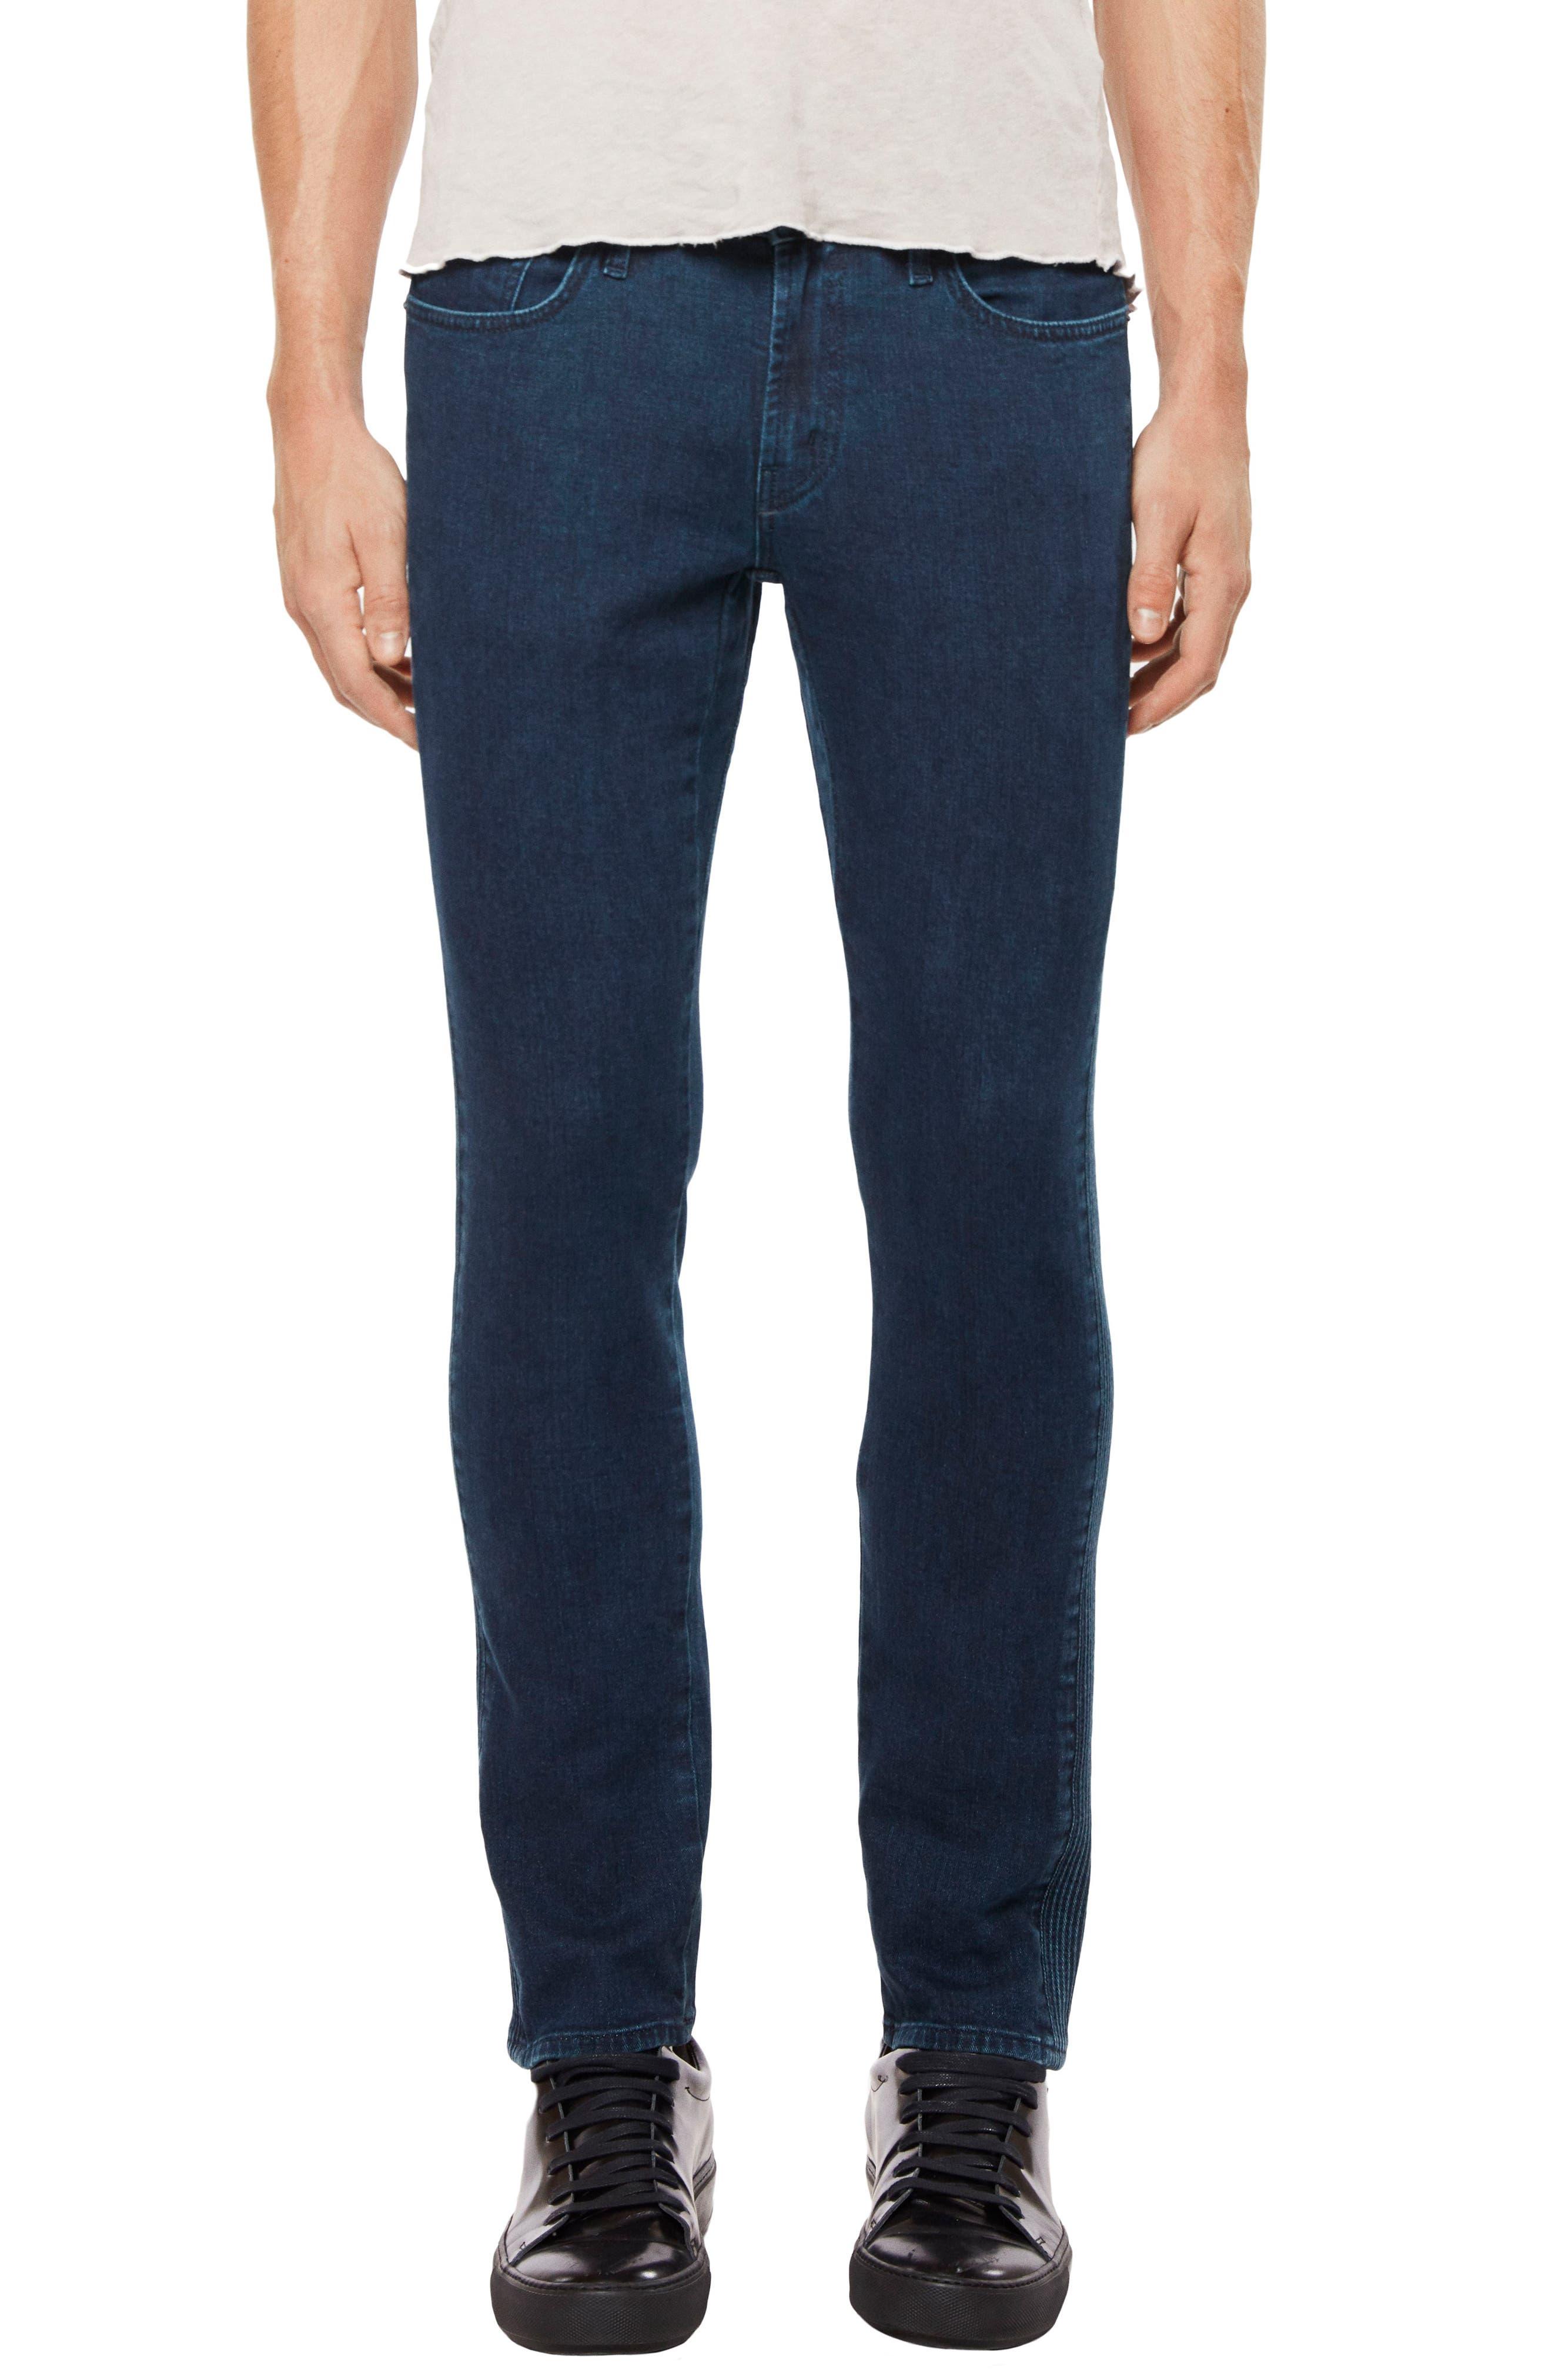 J Brand Moto Skinny Fit Jeans (Afantic)